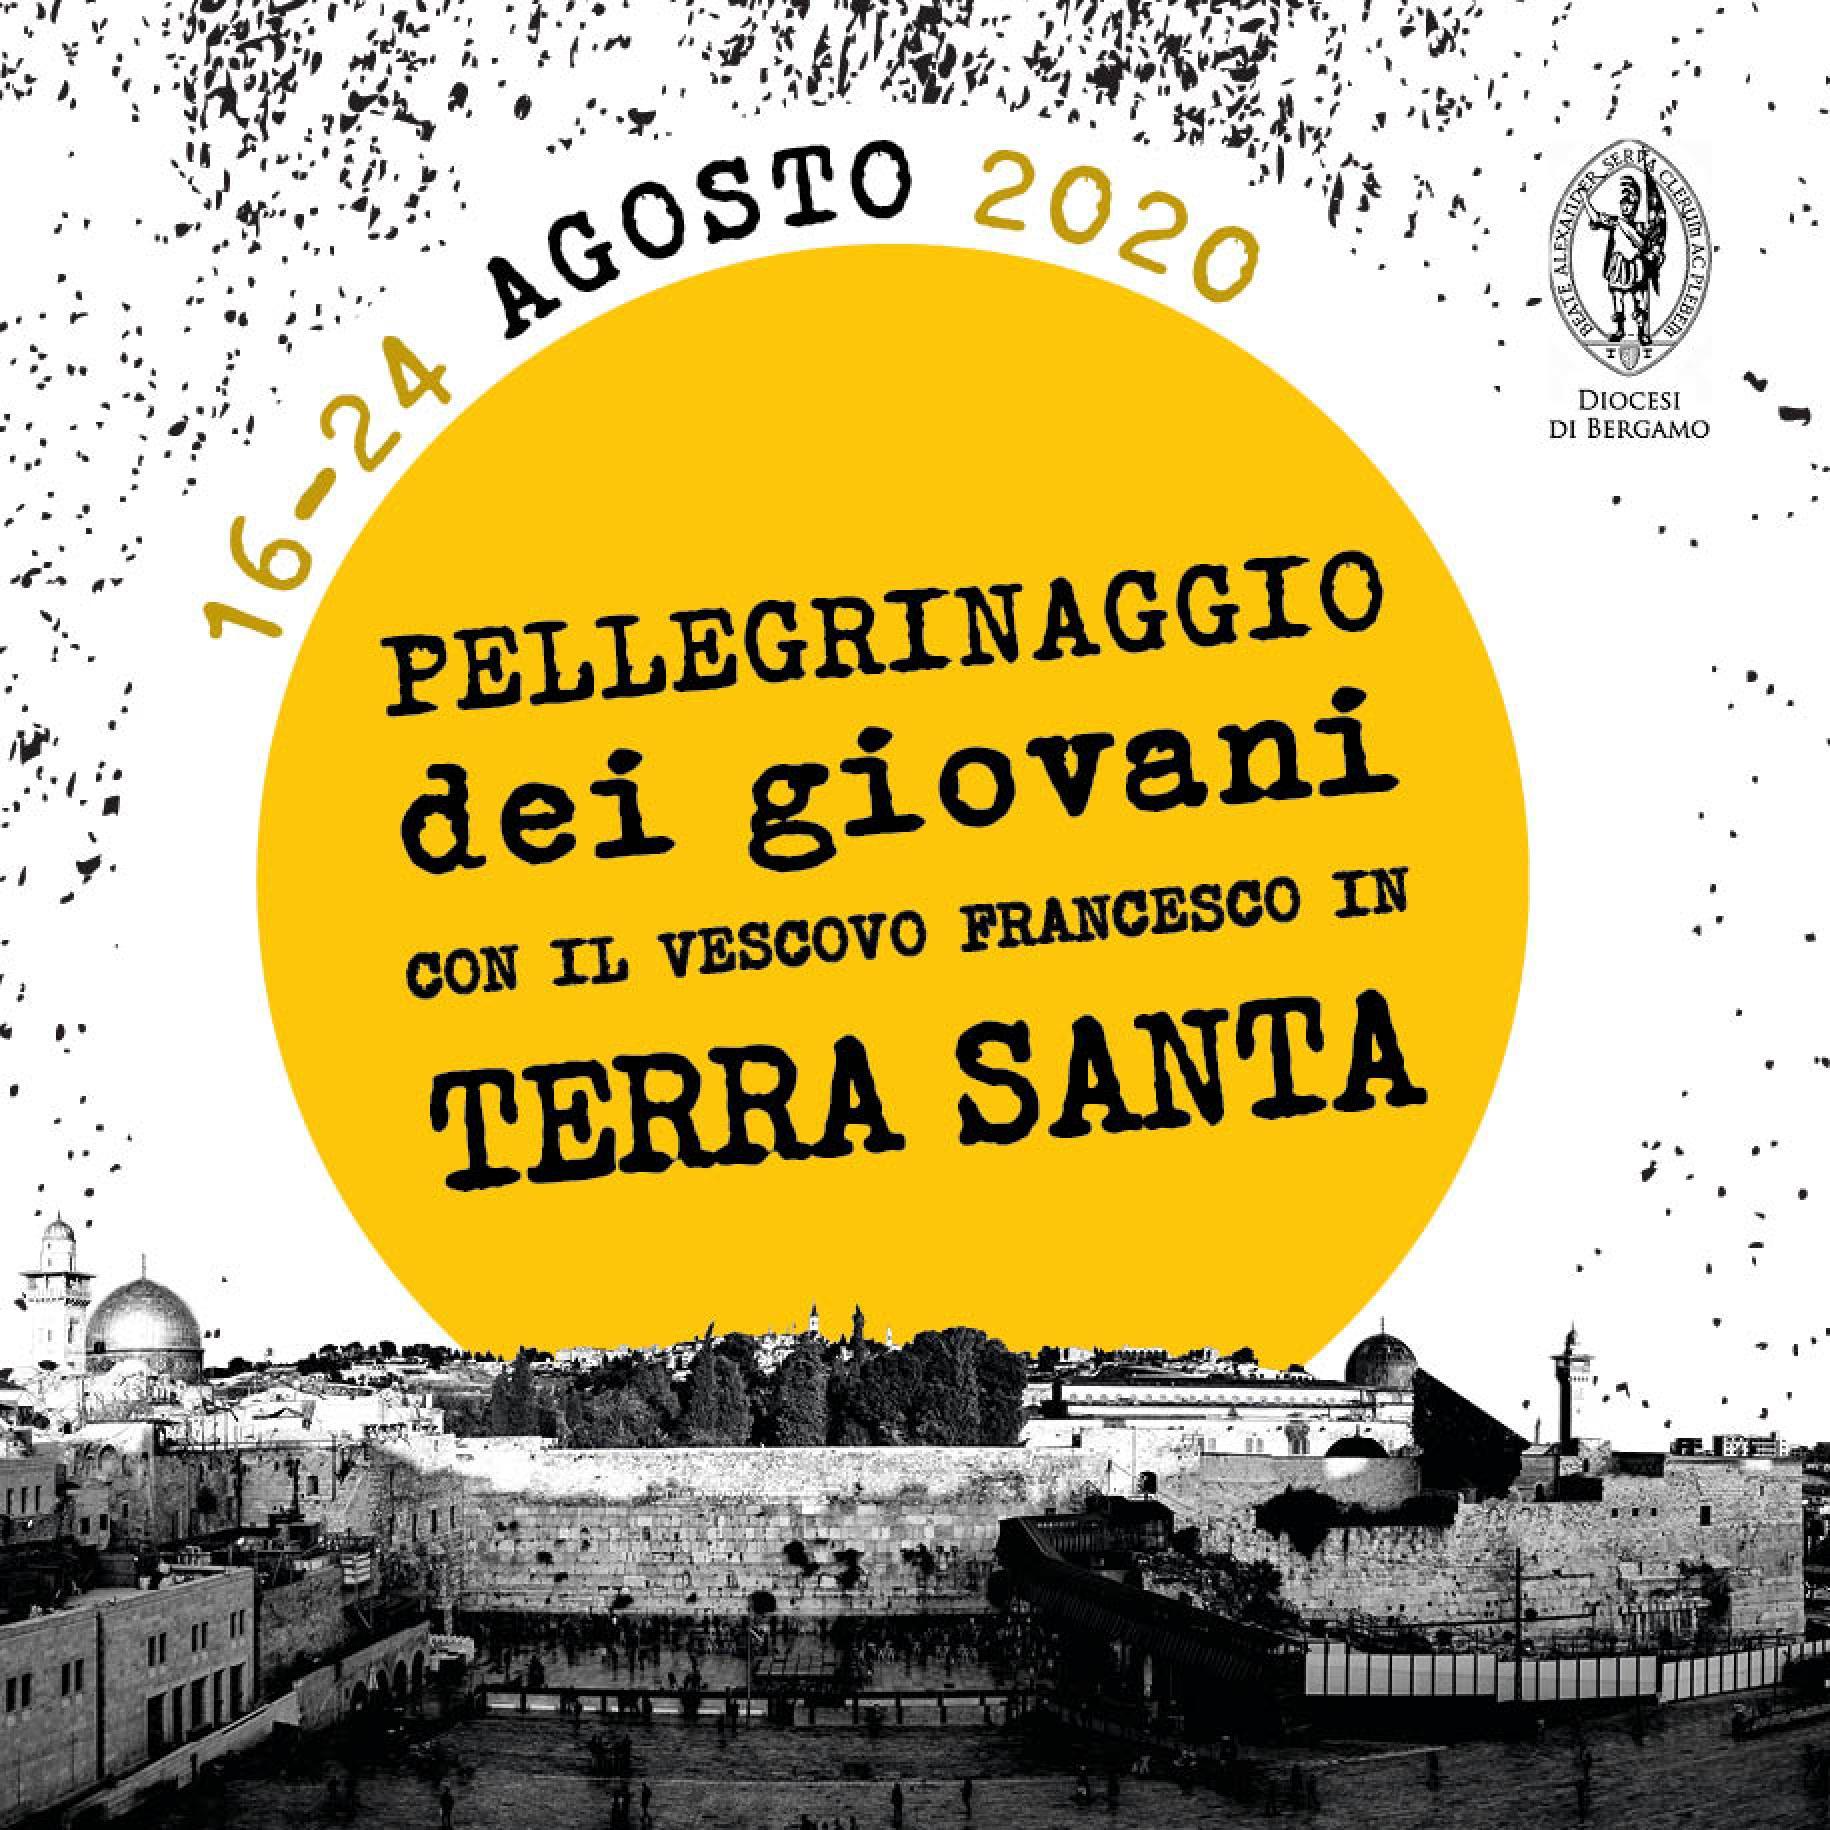 PELLEGRINAGGIO GIOVANI | TERRA SANTA 2020 |